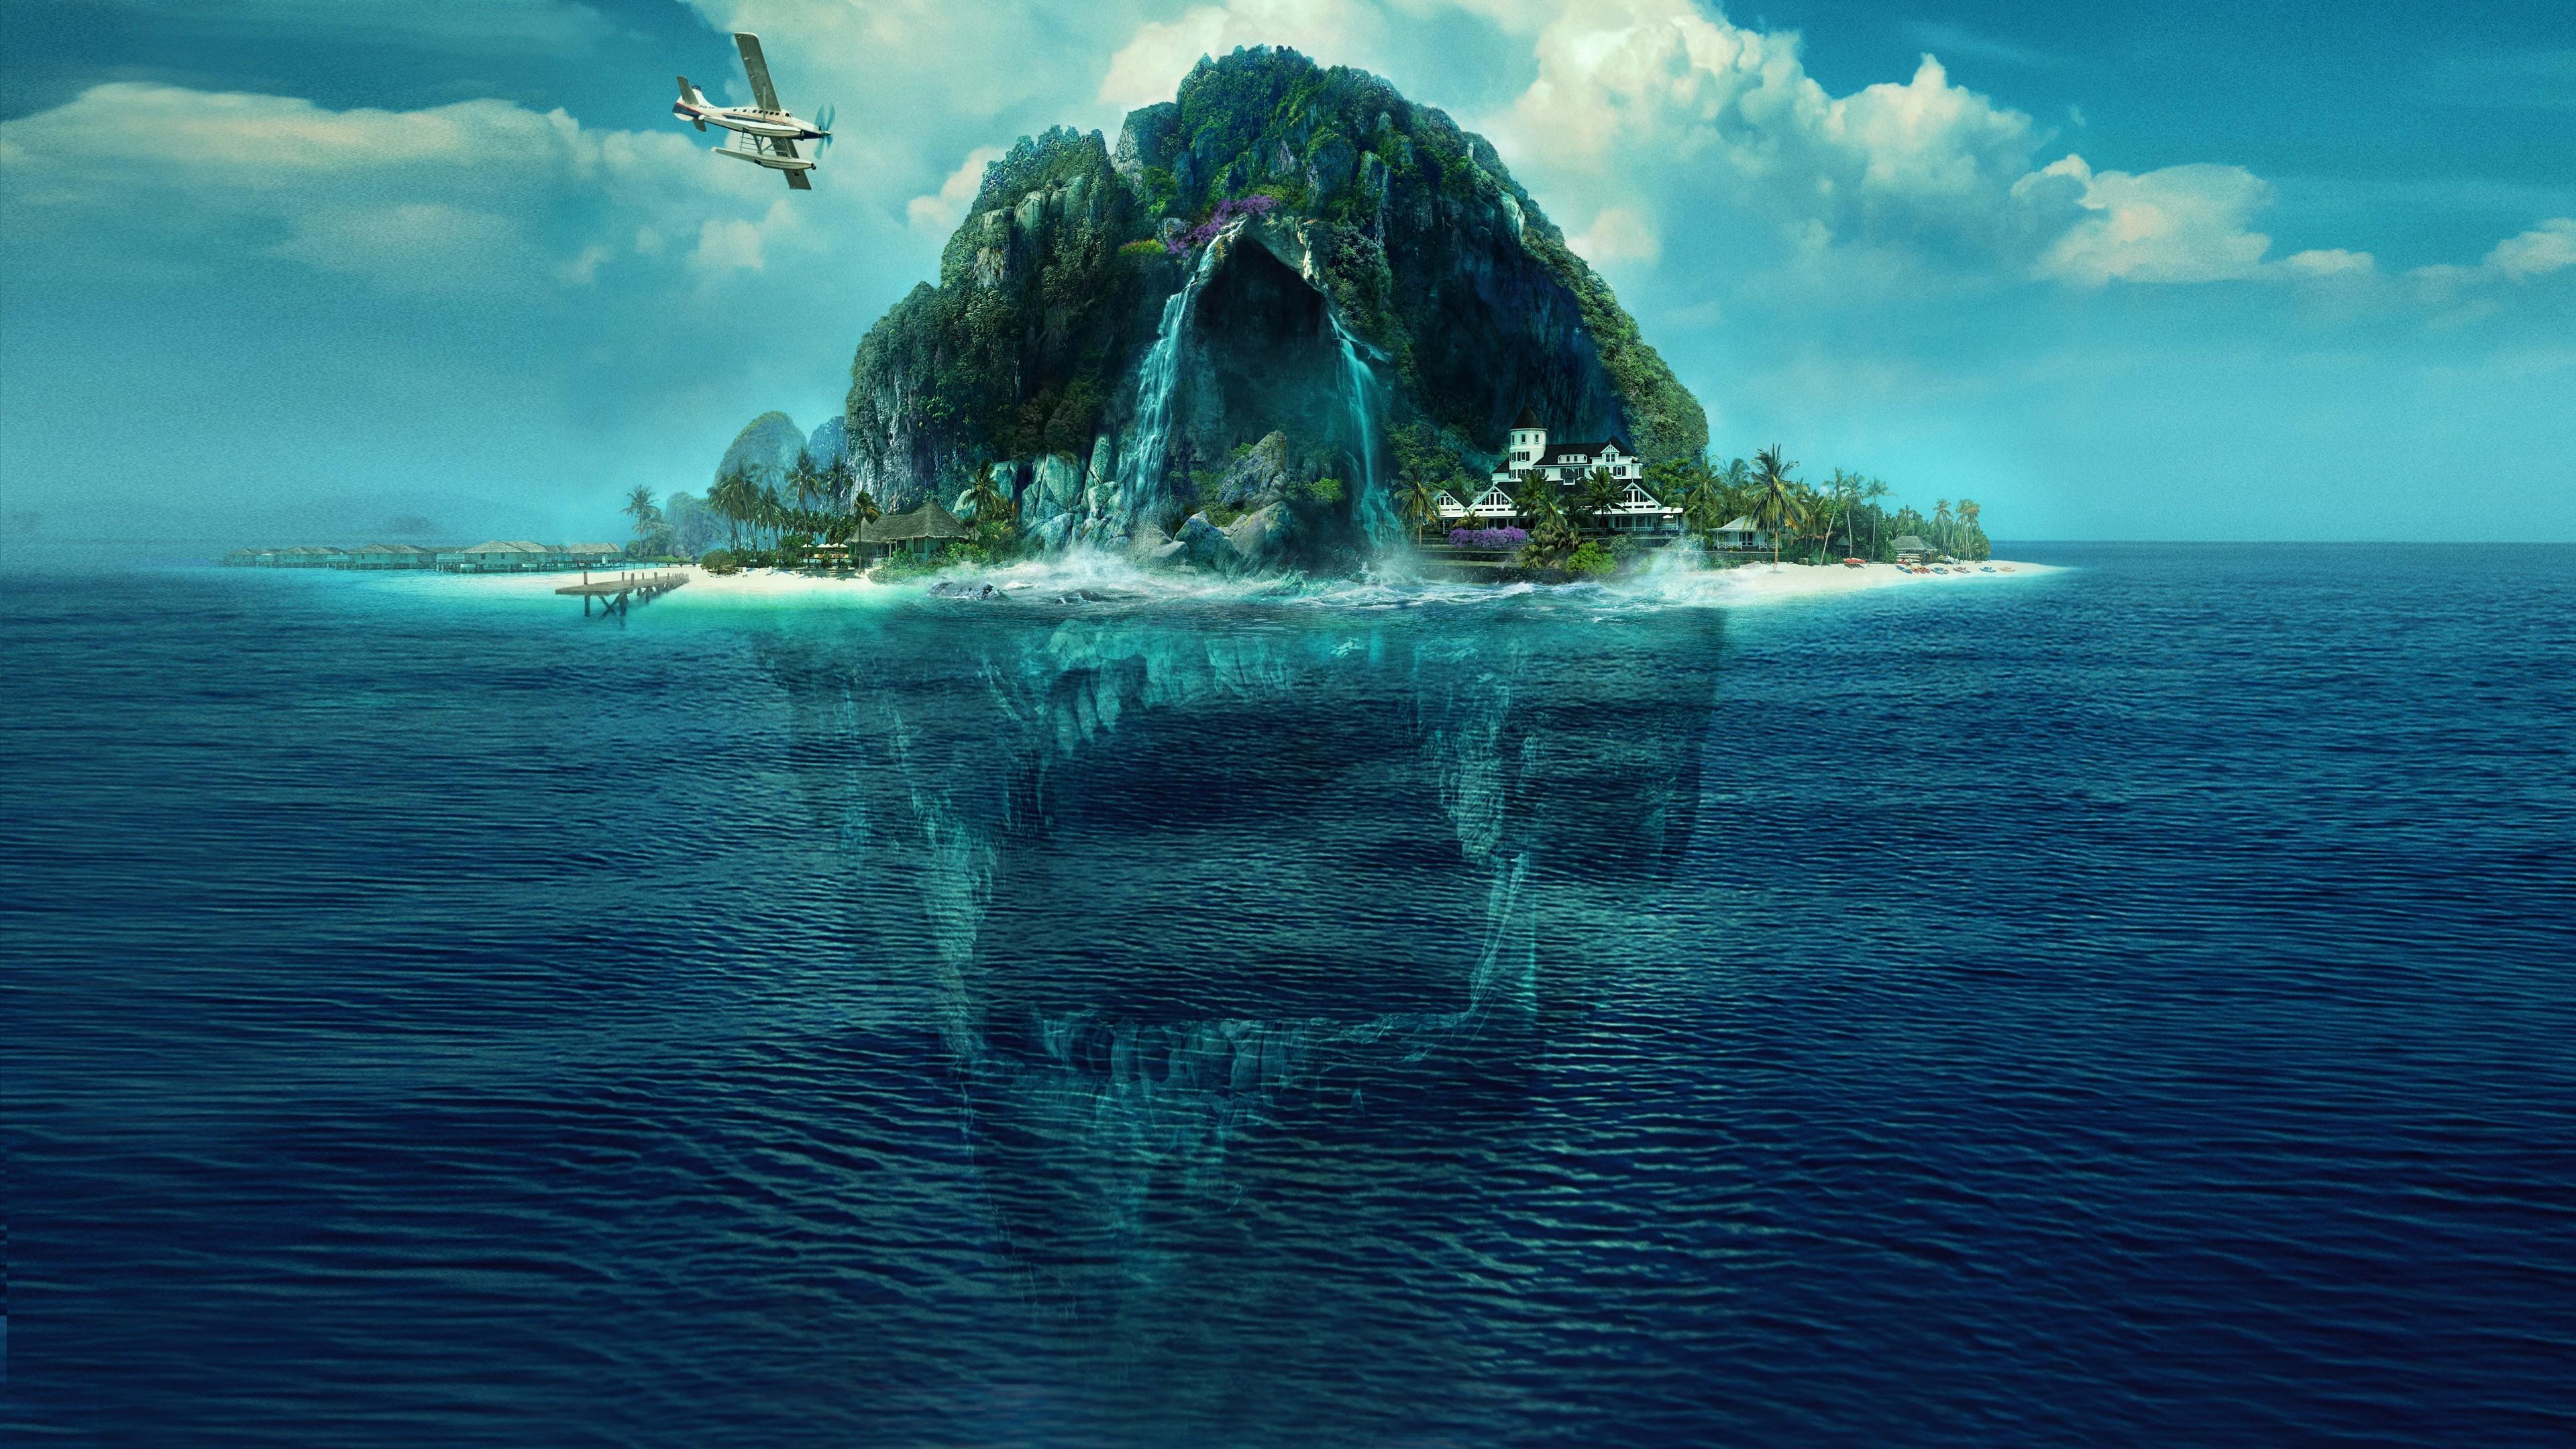 Download 3840x2160 Fantasy Island 2020 Fantastic Movies Ocean 3840x2160